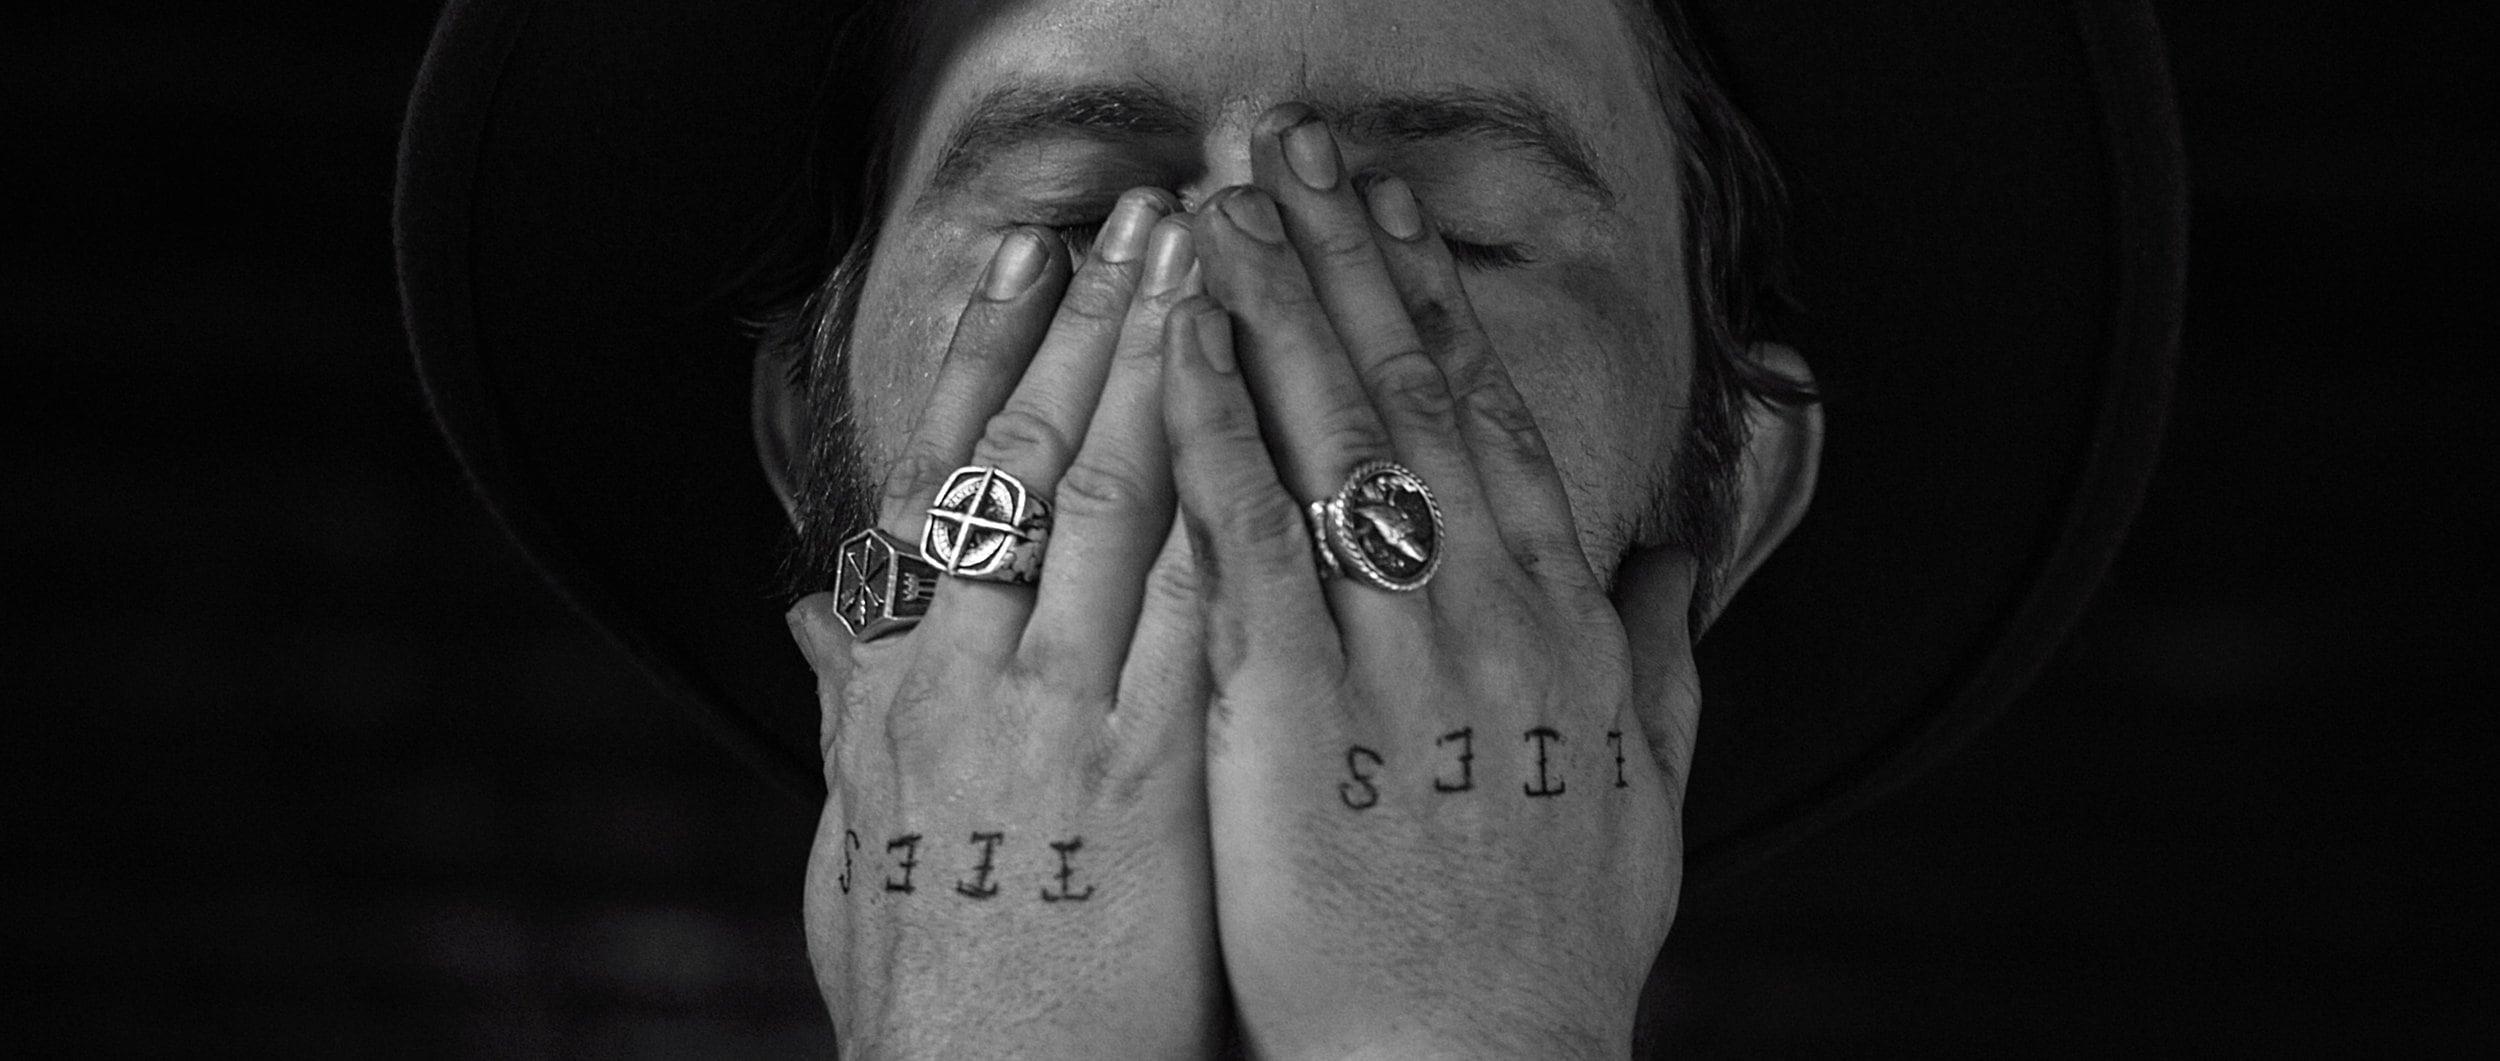 Gun Shy - Matthew Mayfield